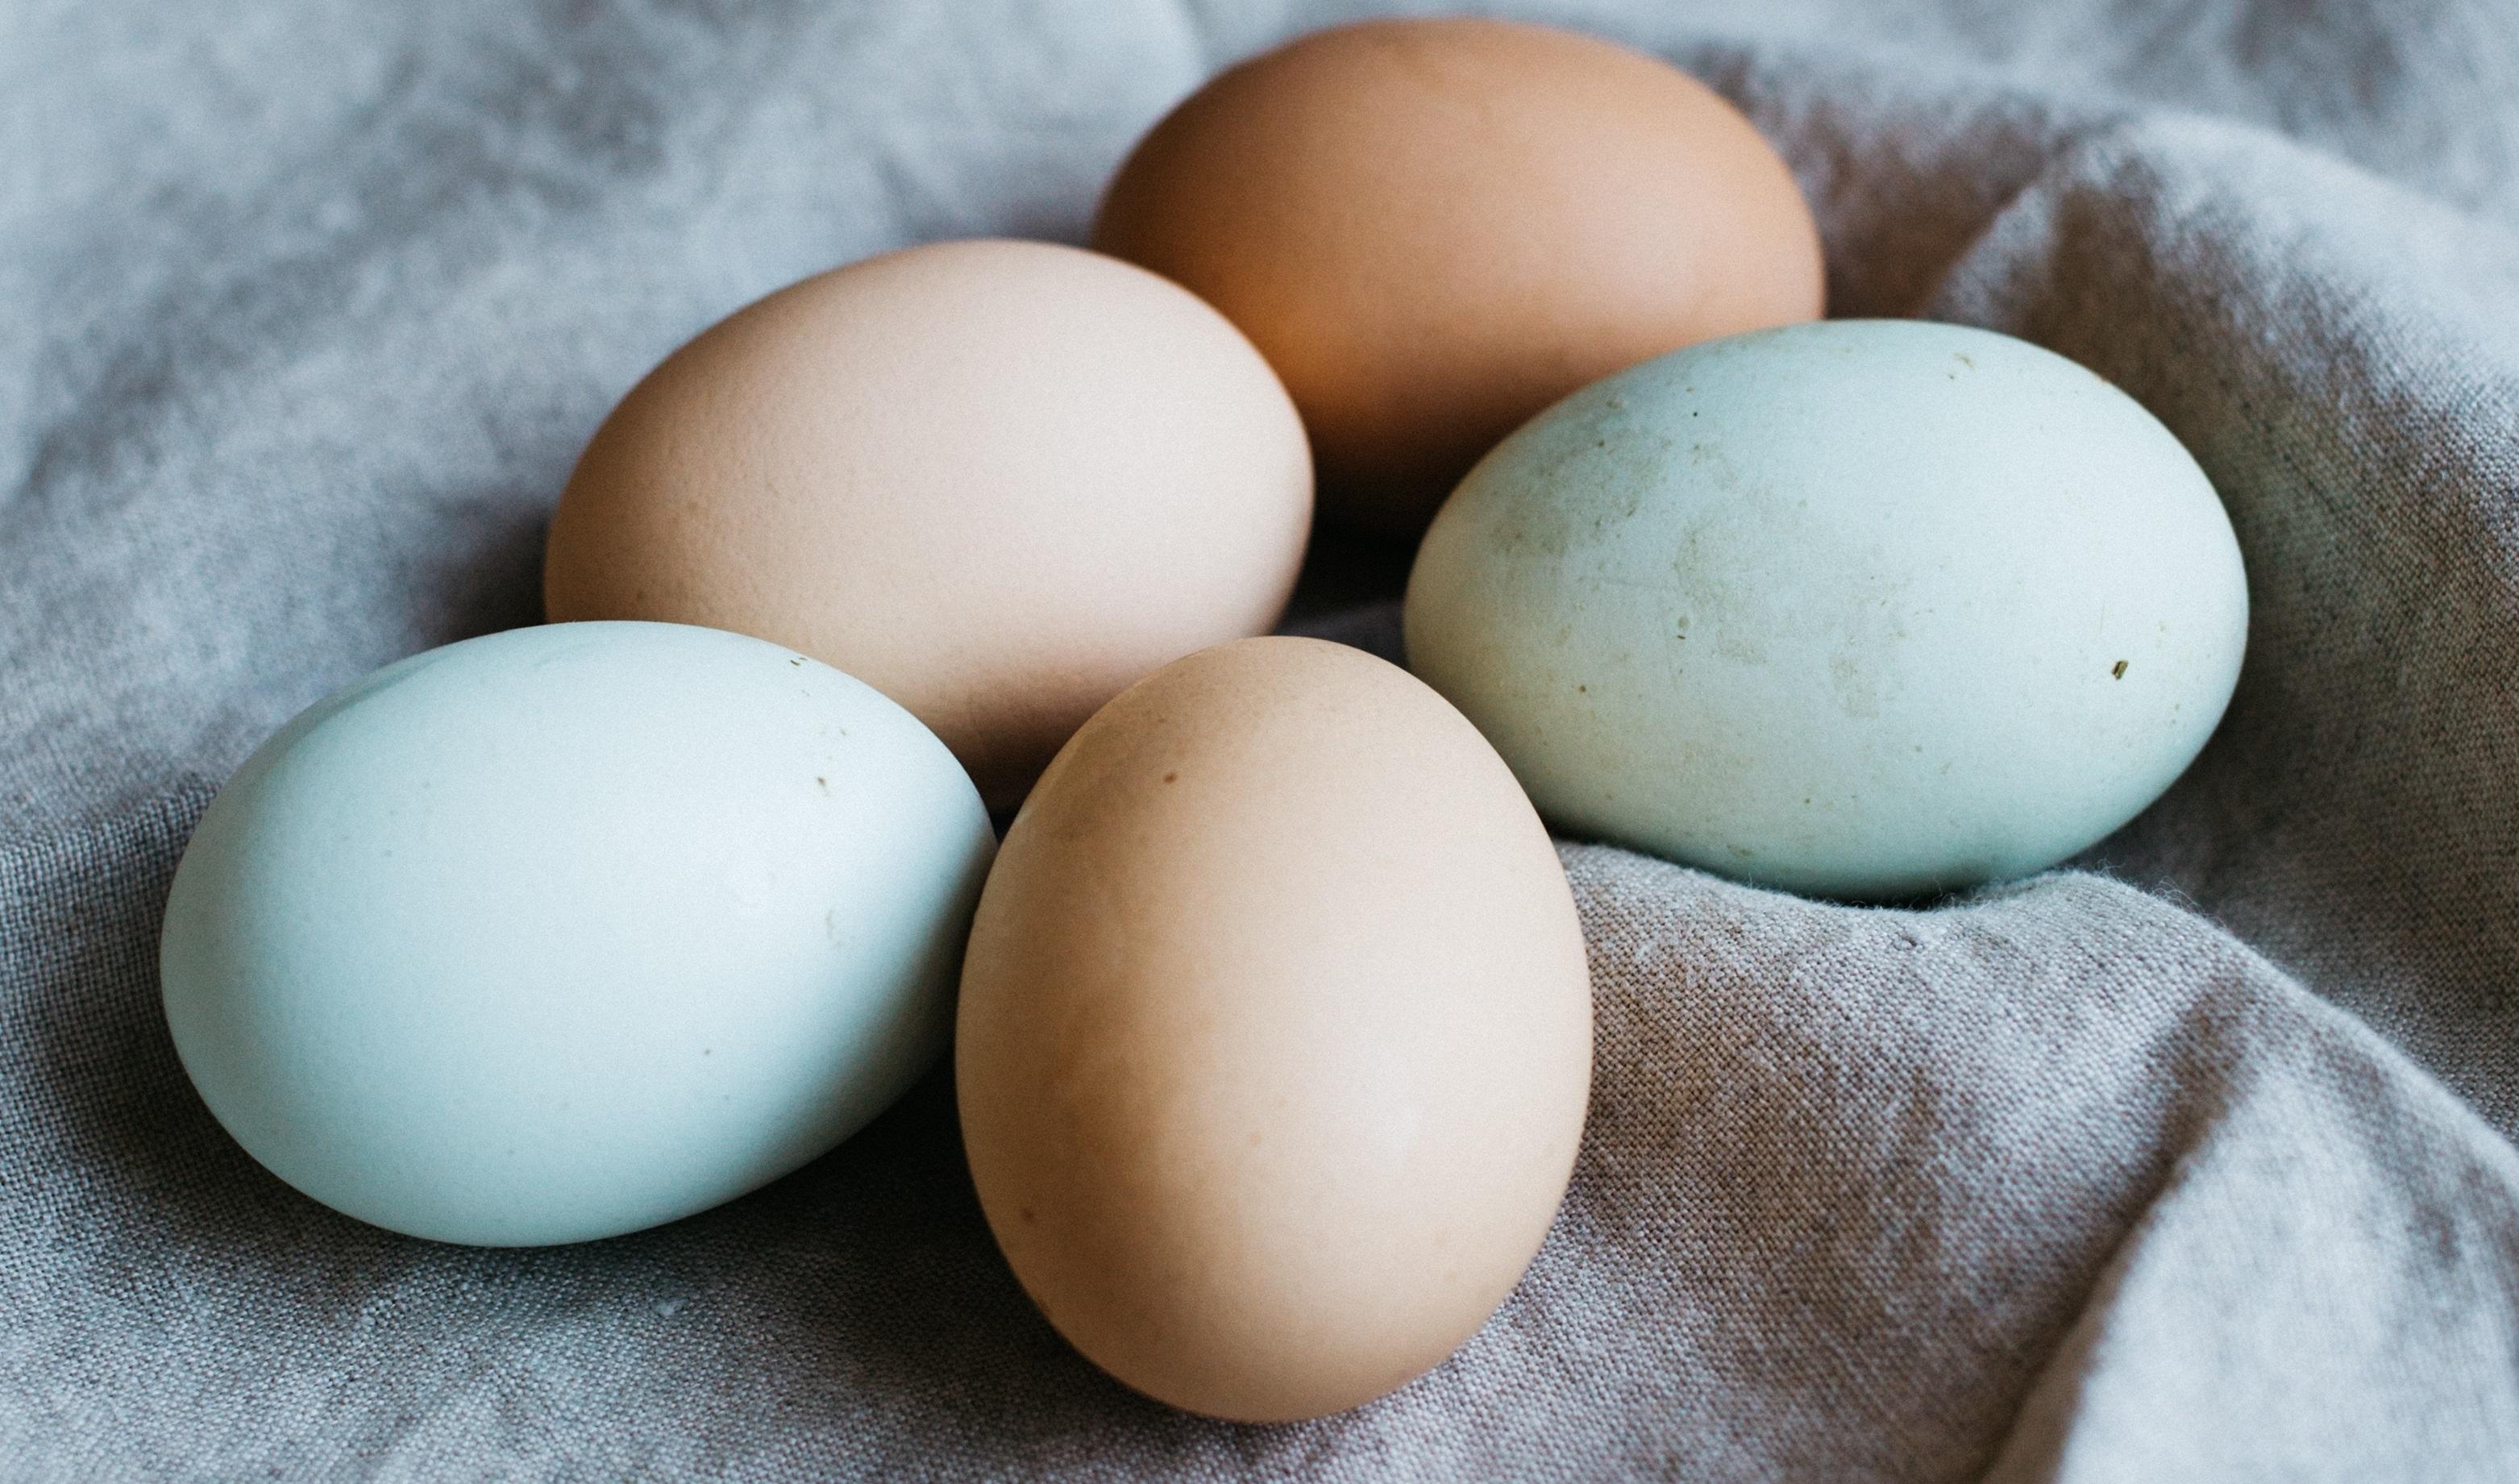 Hamilelikte Yumurta Yemenin Faydaları